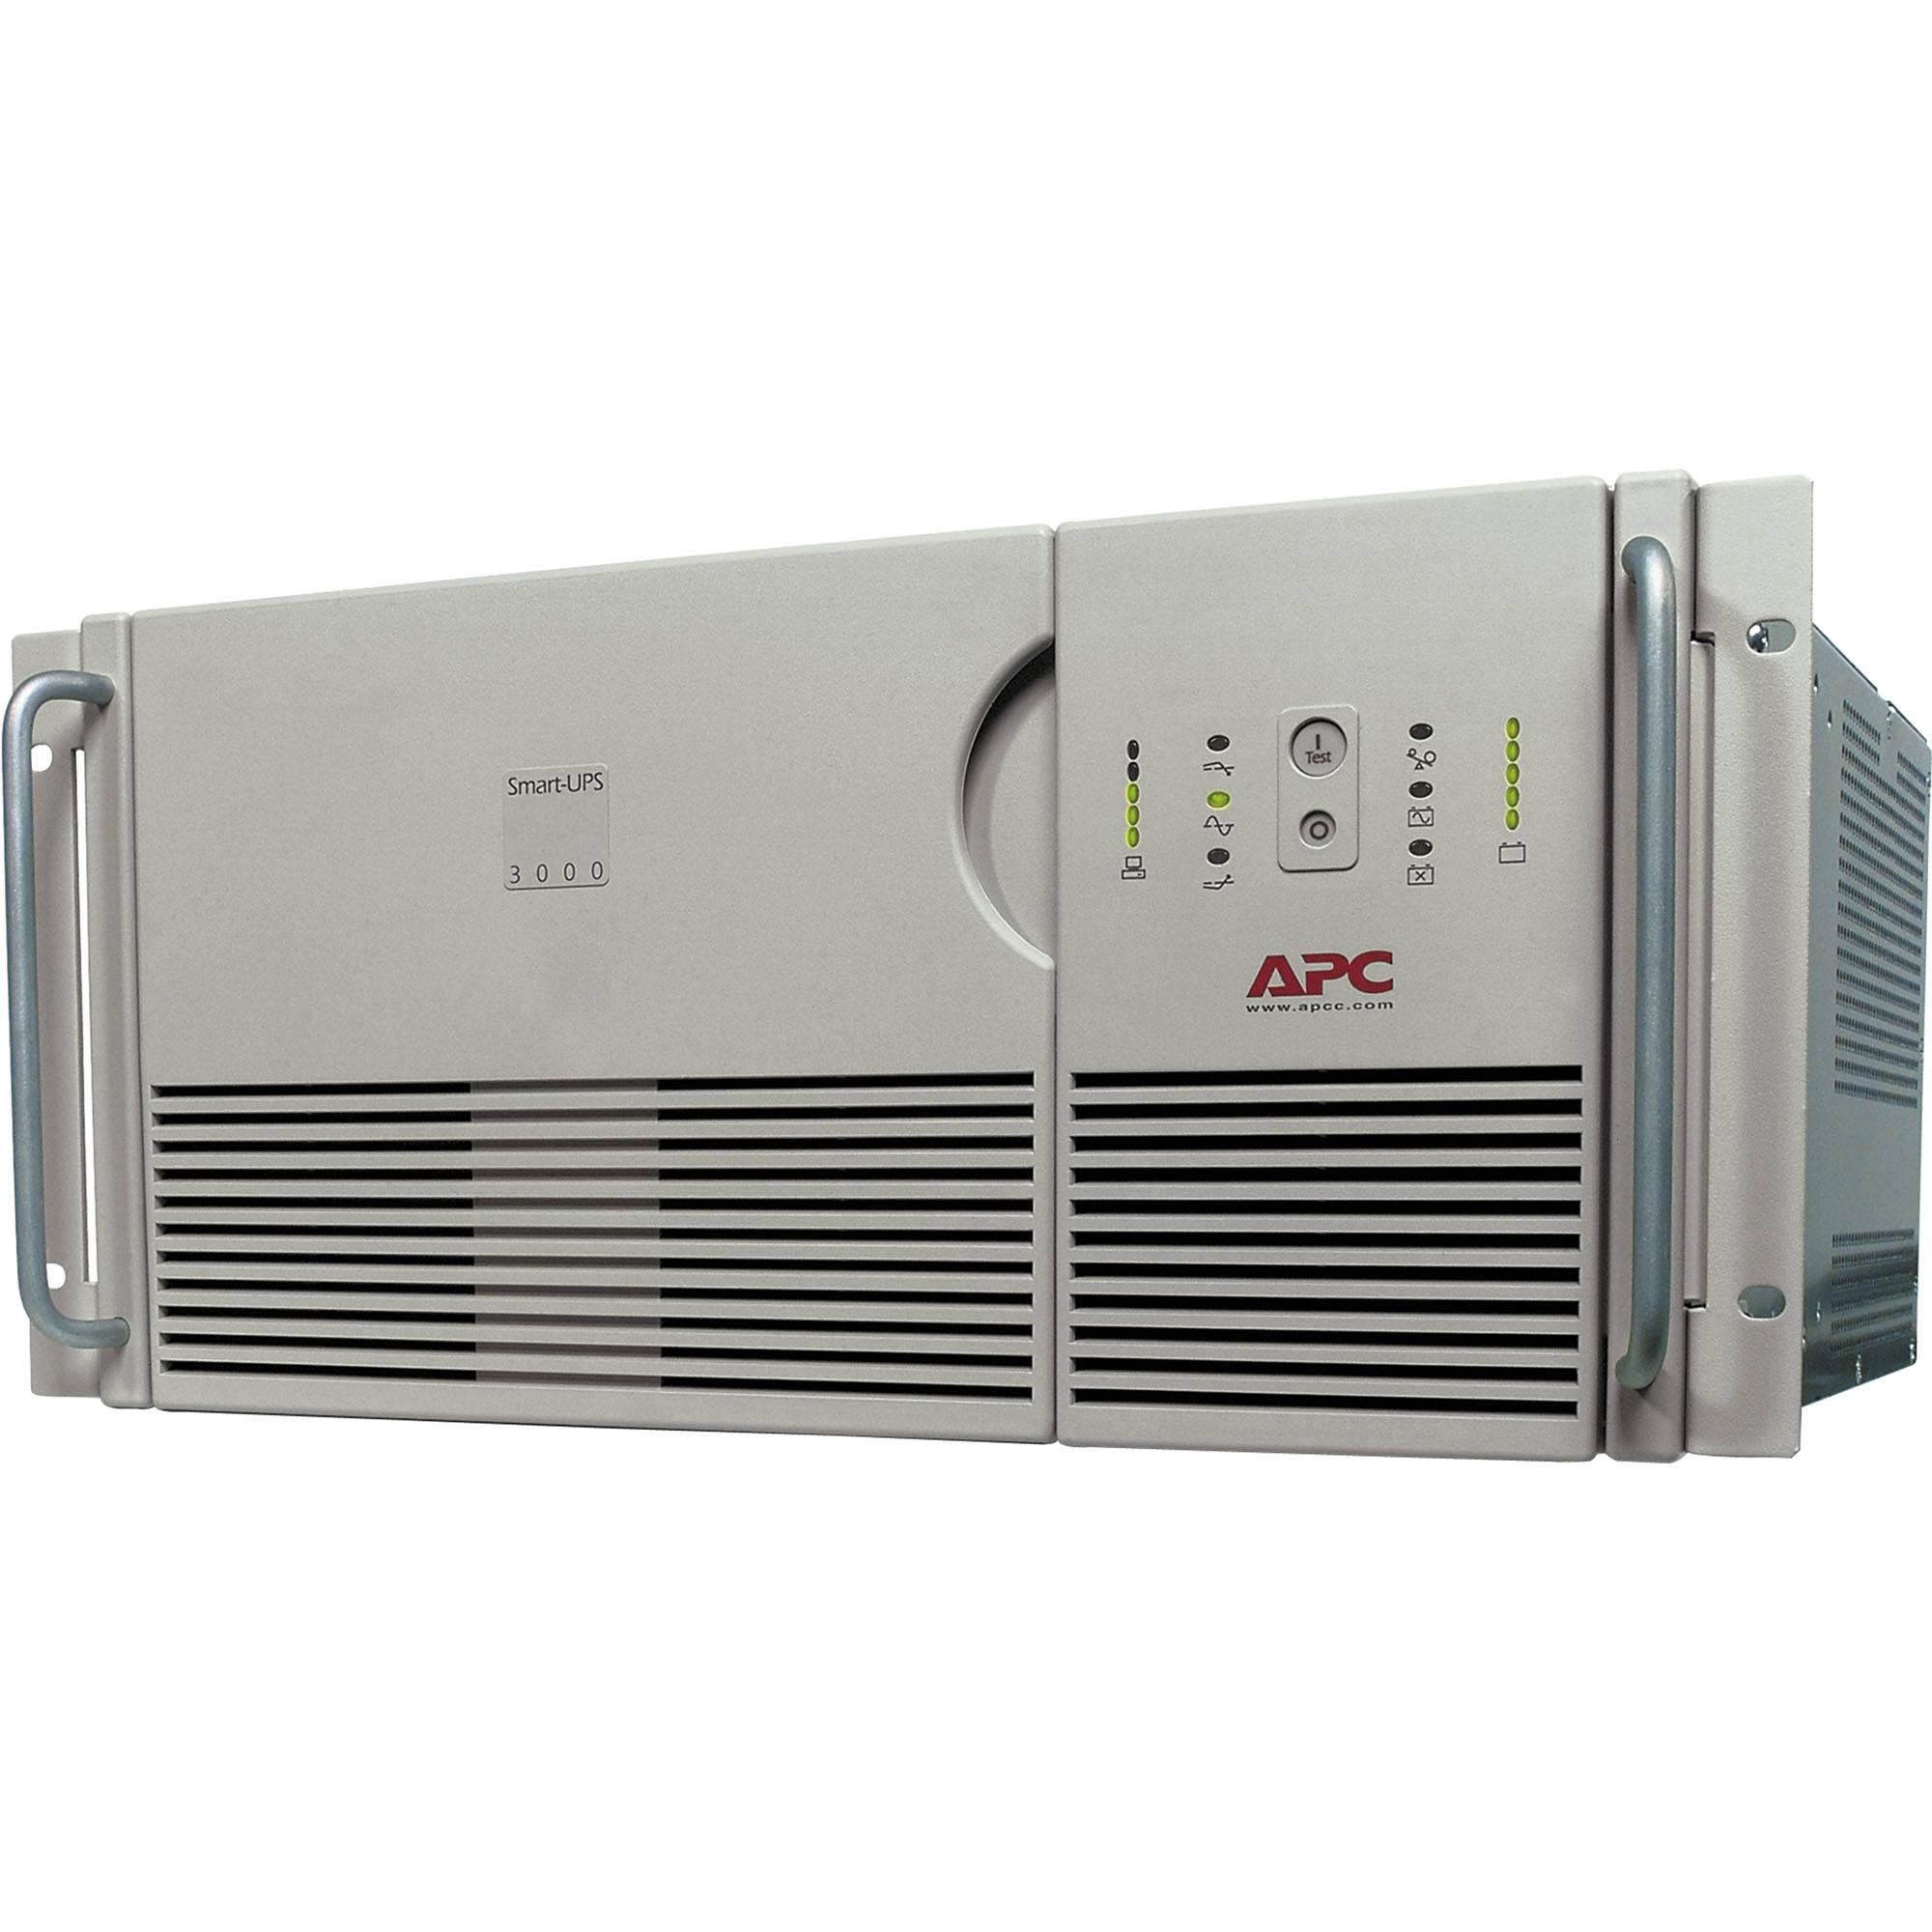 APC SU3000RMX93 Smart-UPS Uninterruptible Power Supply